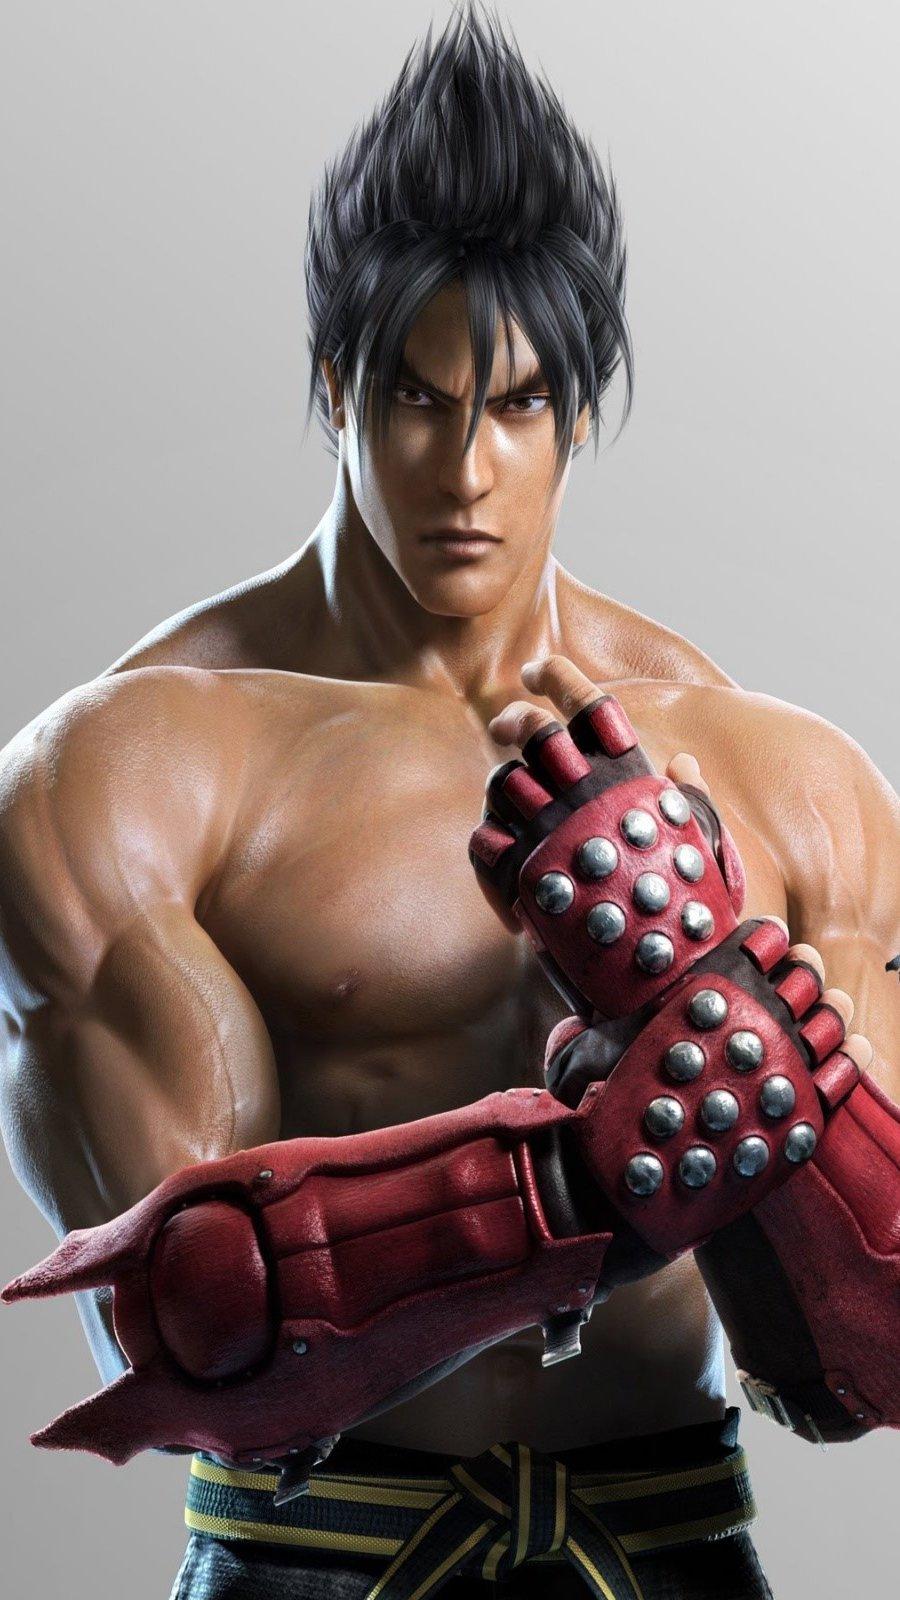 Wallpaper JIn Kazama of Tekken Vertical